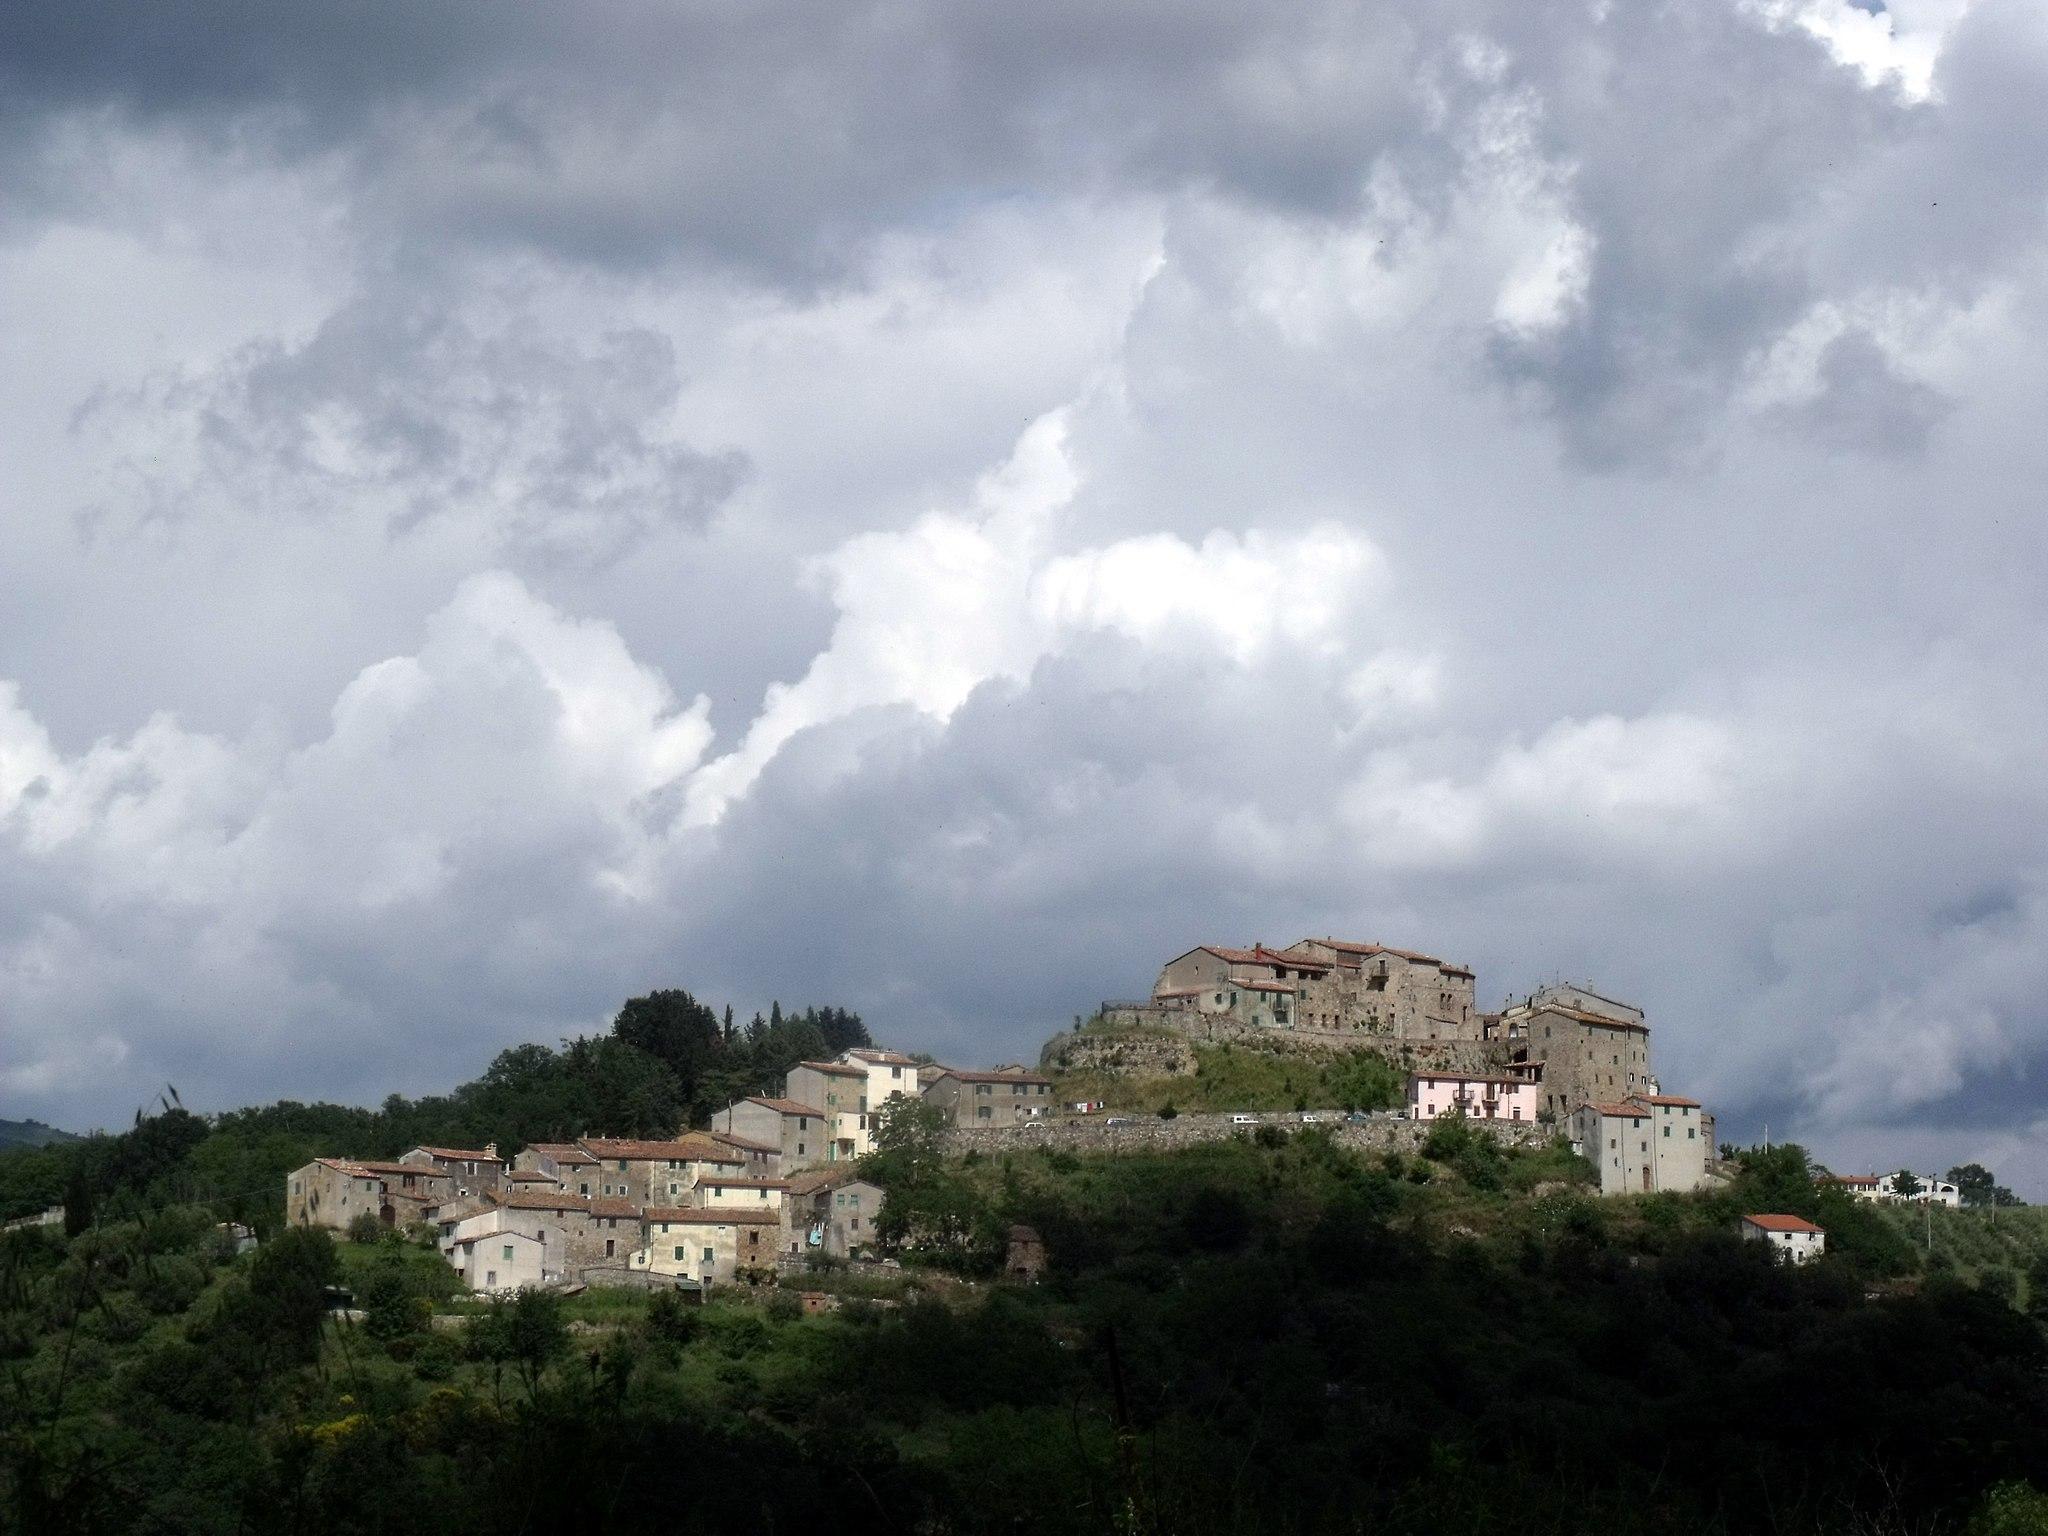 Cana, RoccalbegnaPanorama1